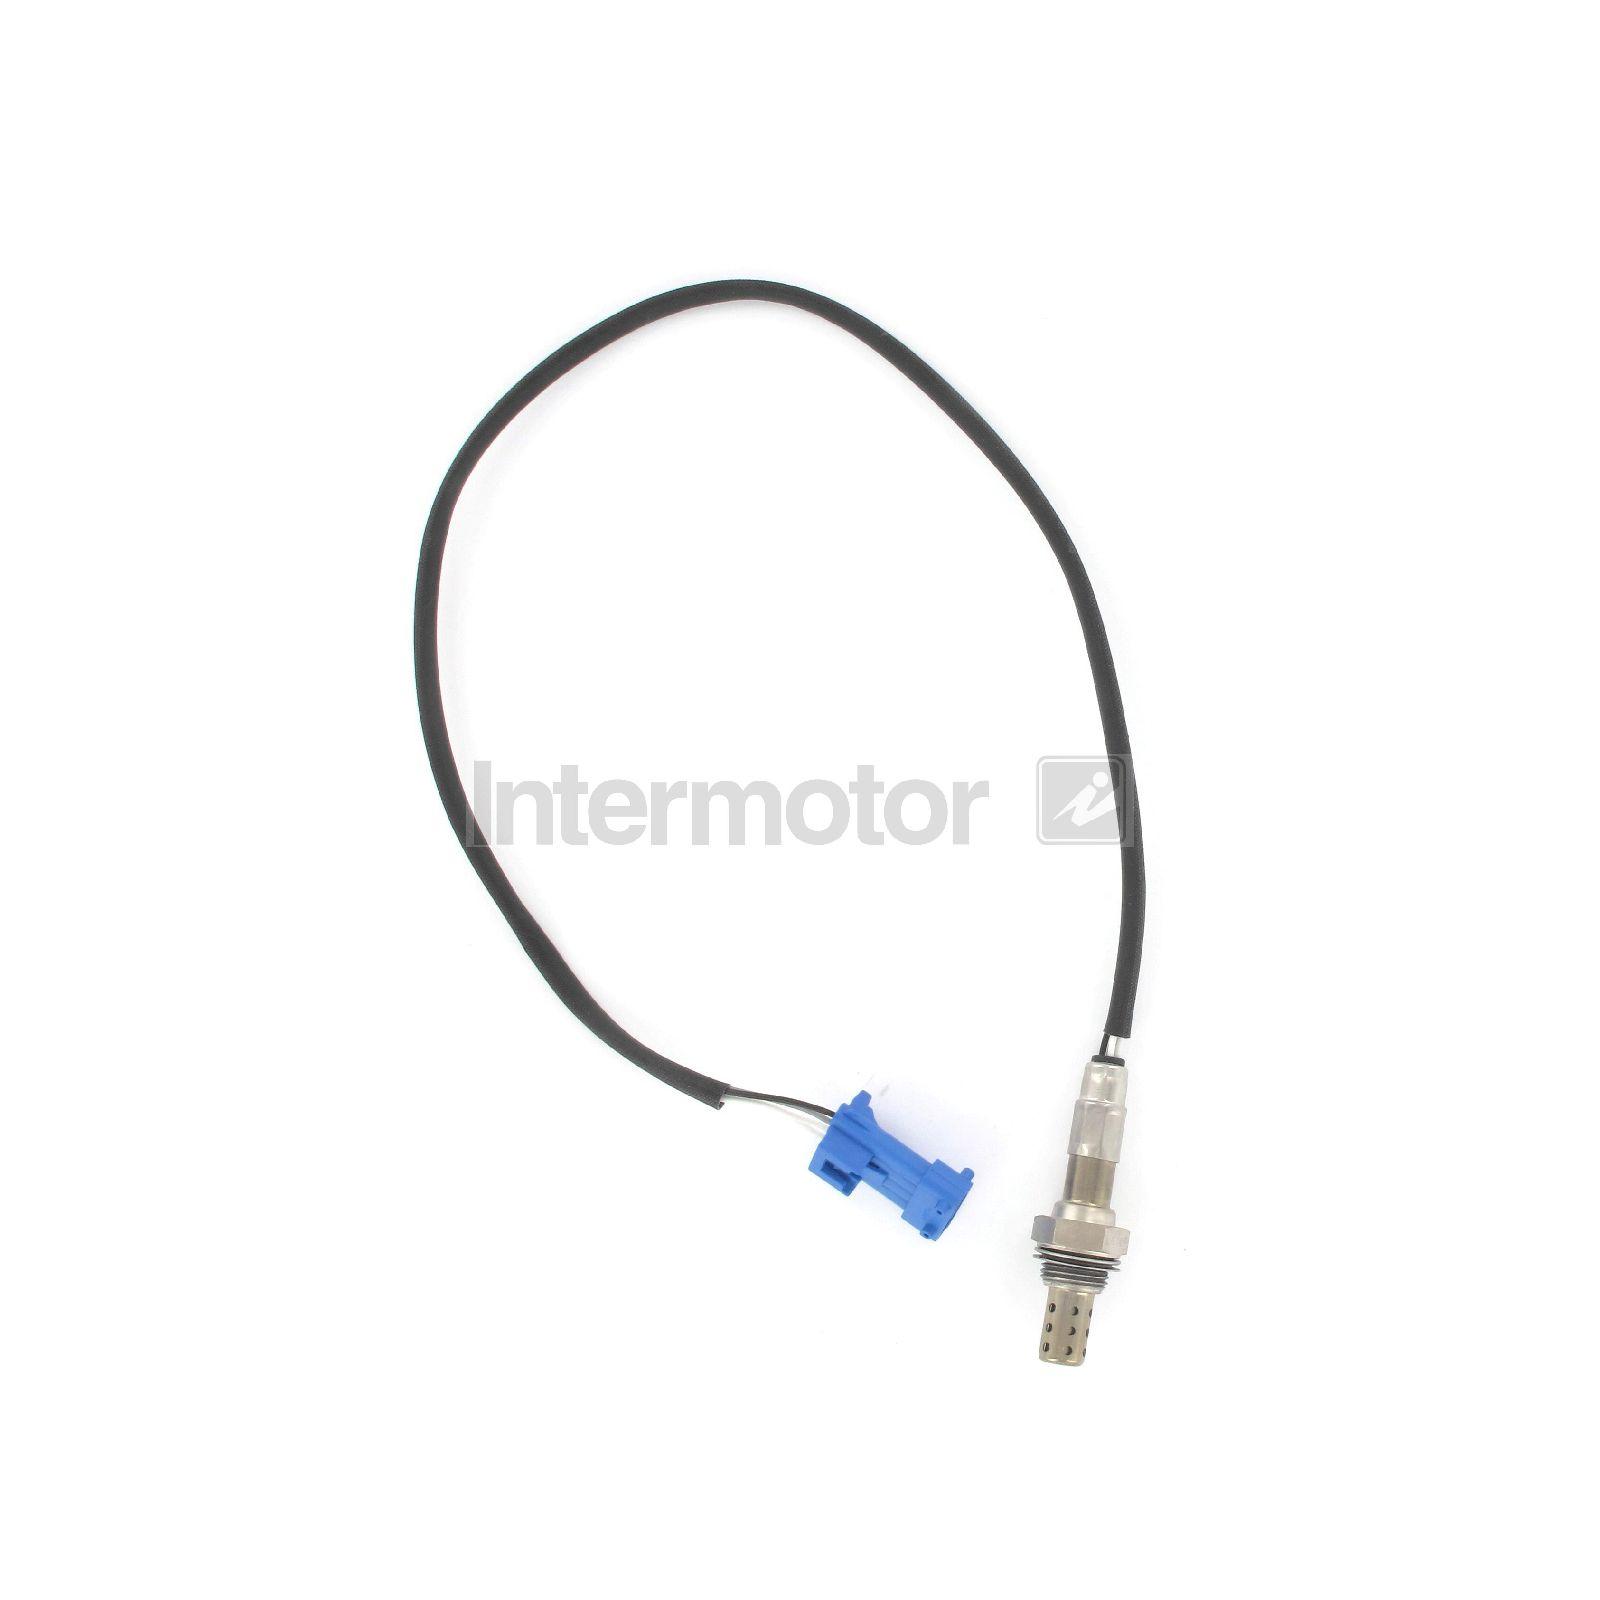 Intermotor Lambda Sensor Oxygen O2 Exhaust Probe Genuine Replacement